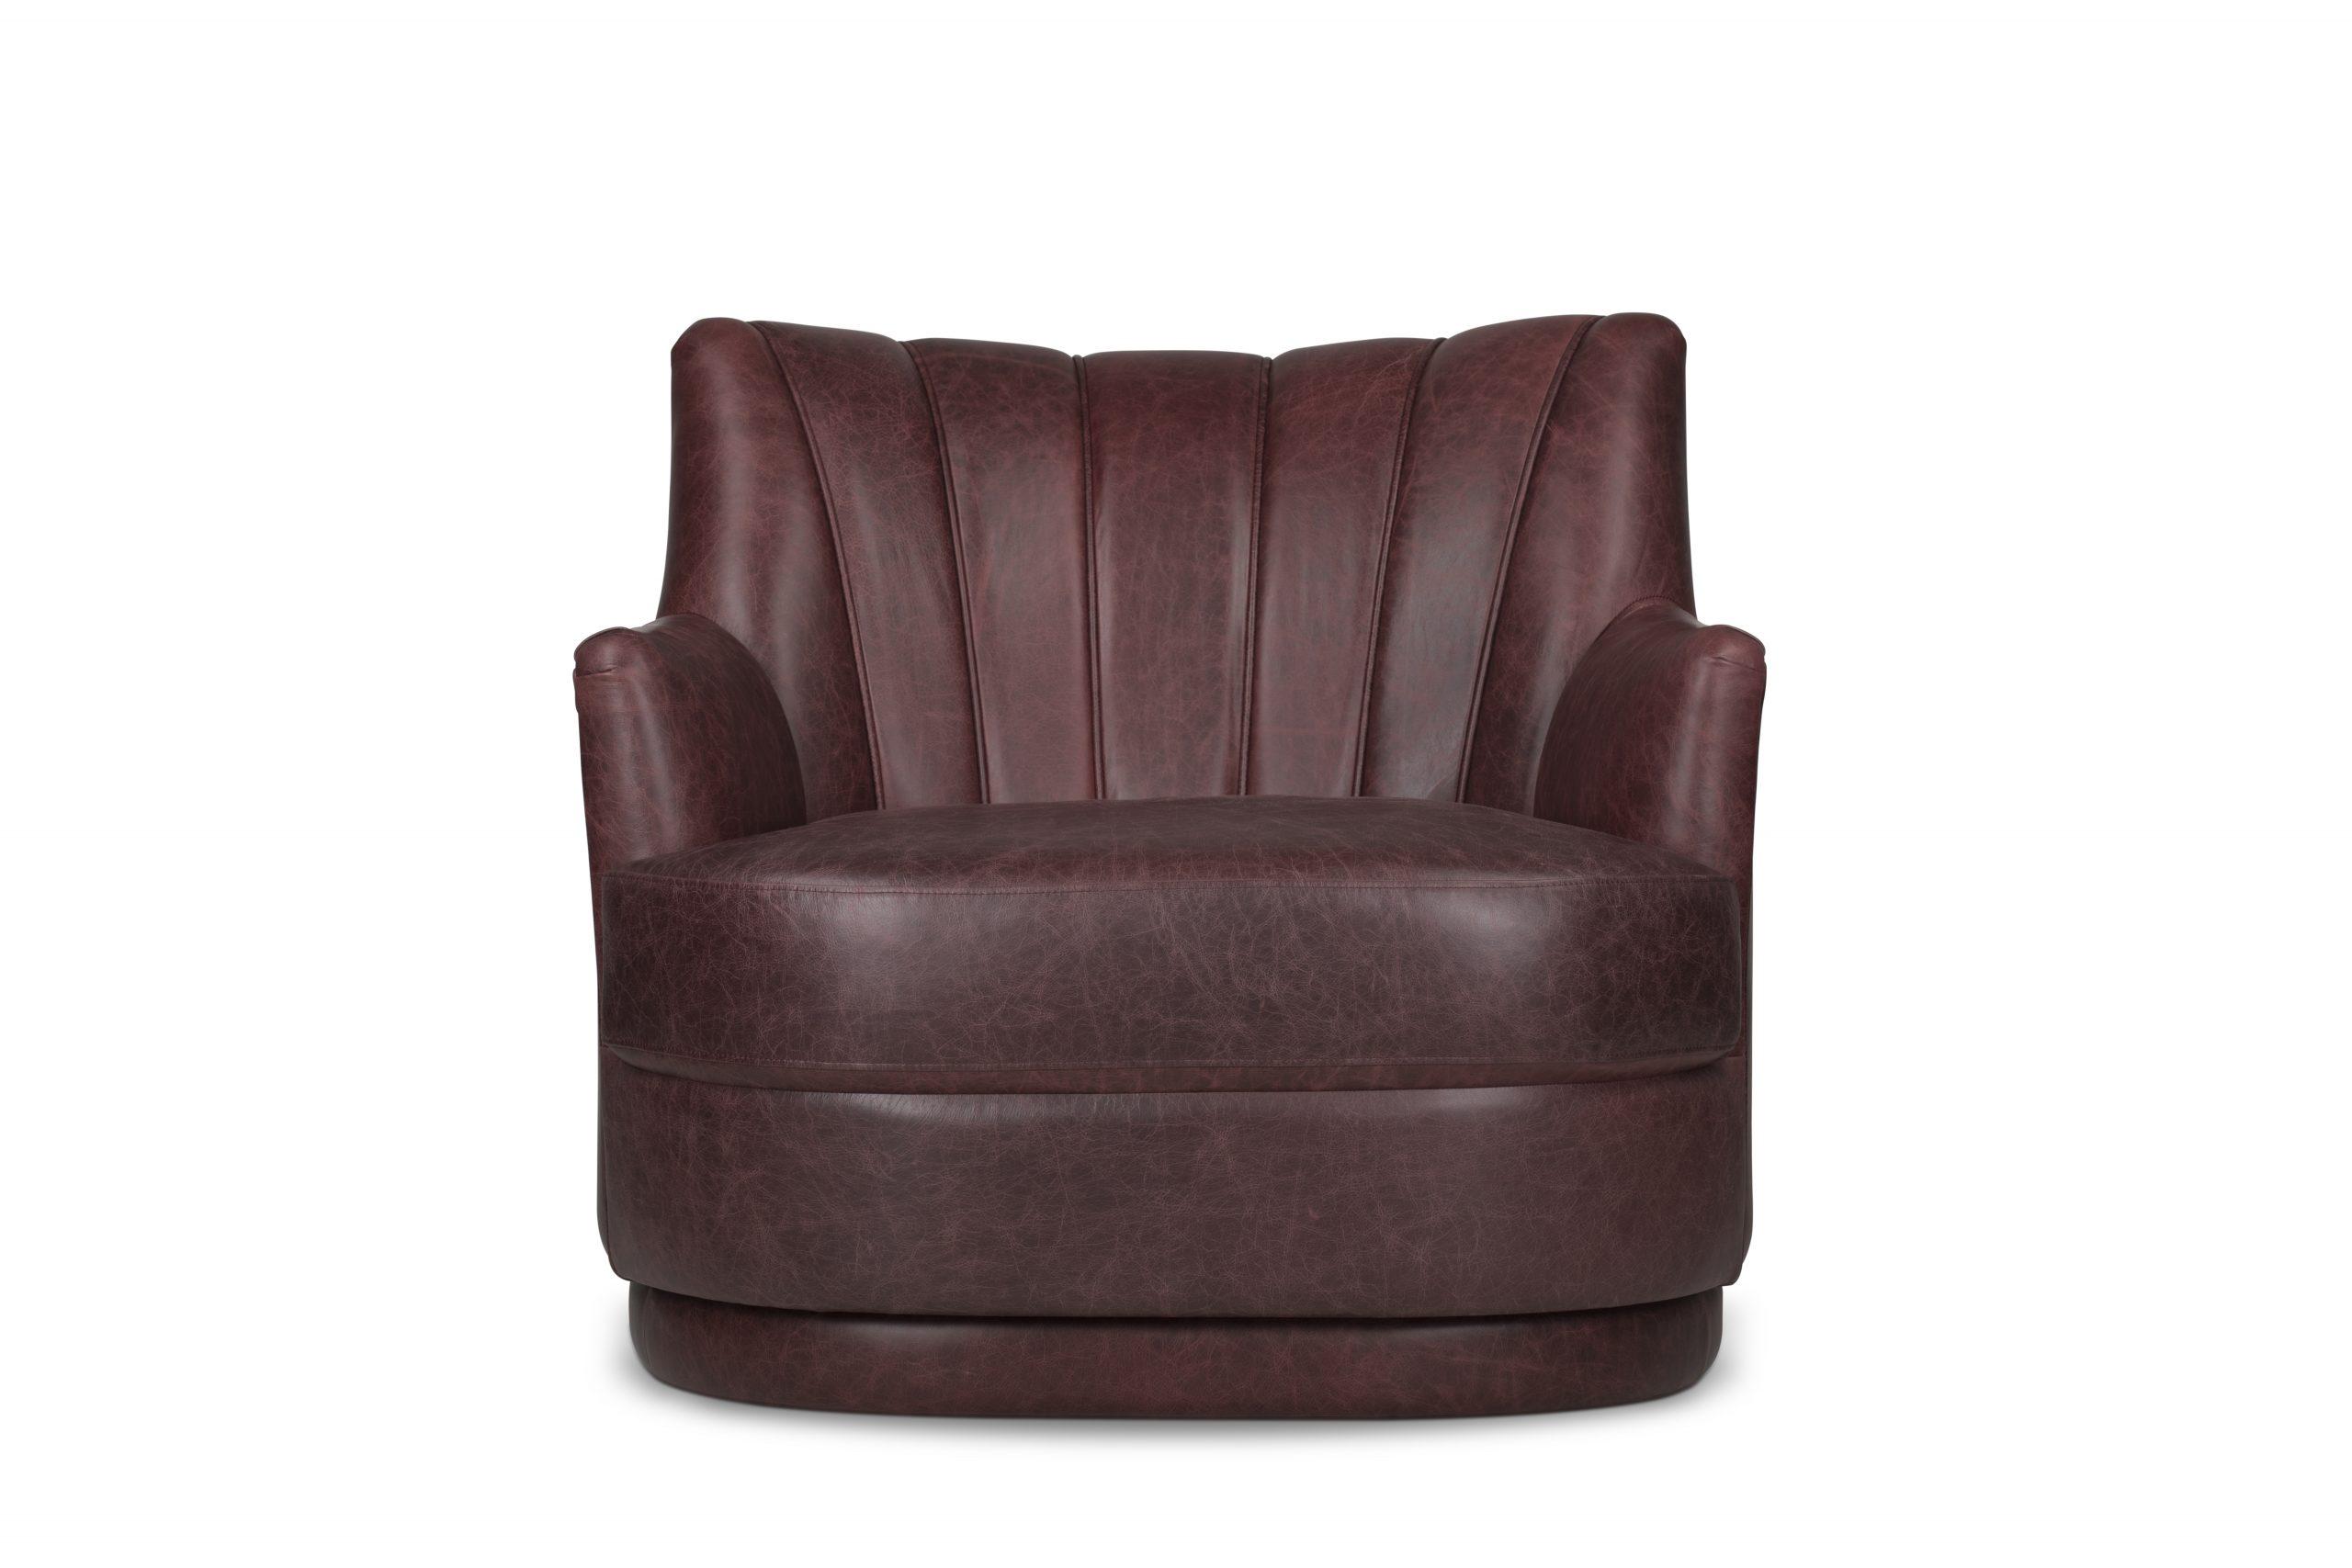 Sydney Interior Designers: The Top 10 Modern Chairs Inspirations sydney interior designers Sydney Interior Designers: The Top 10 Modern Chairs Inspirations plum single sofa 1 HR scaled